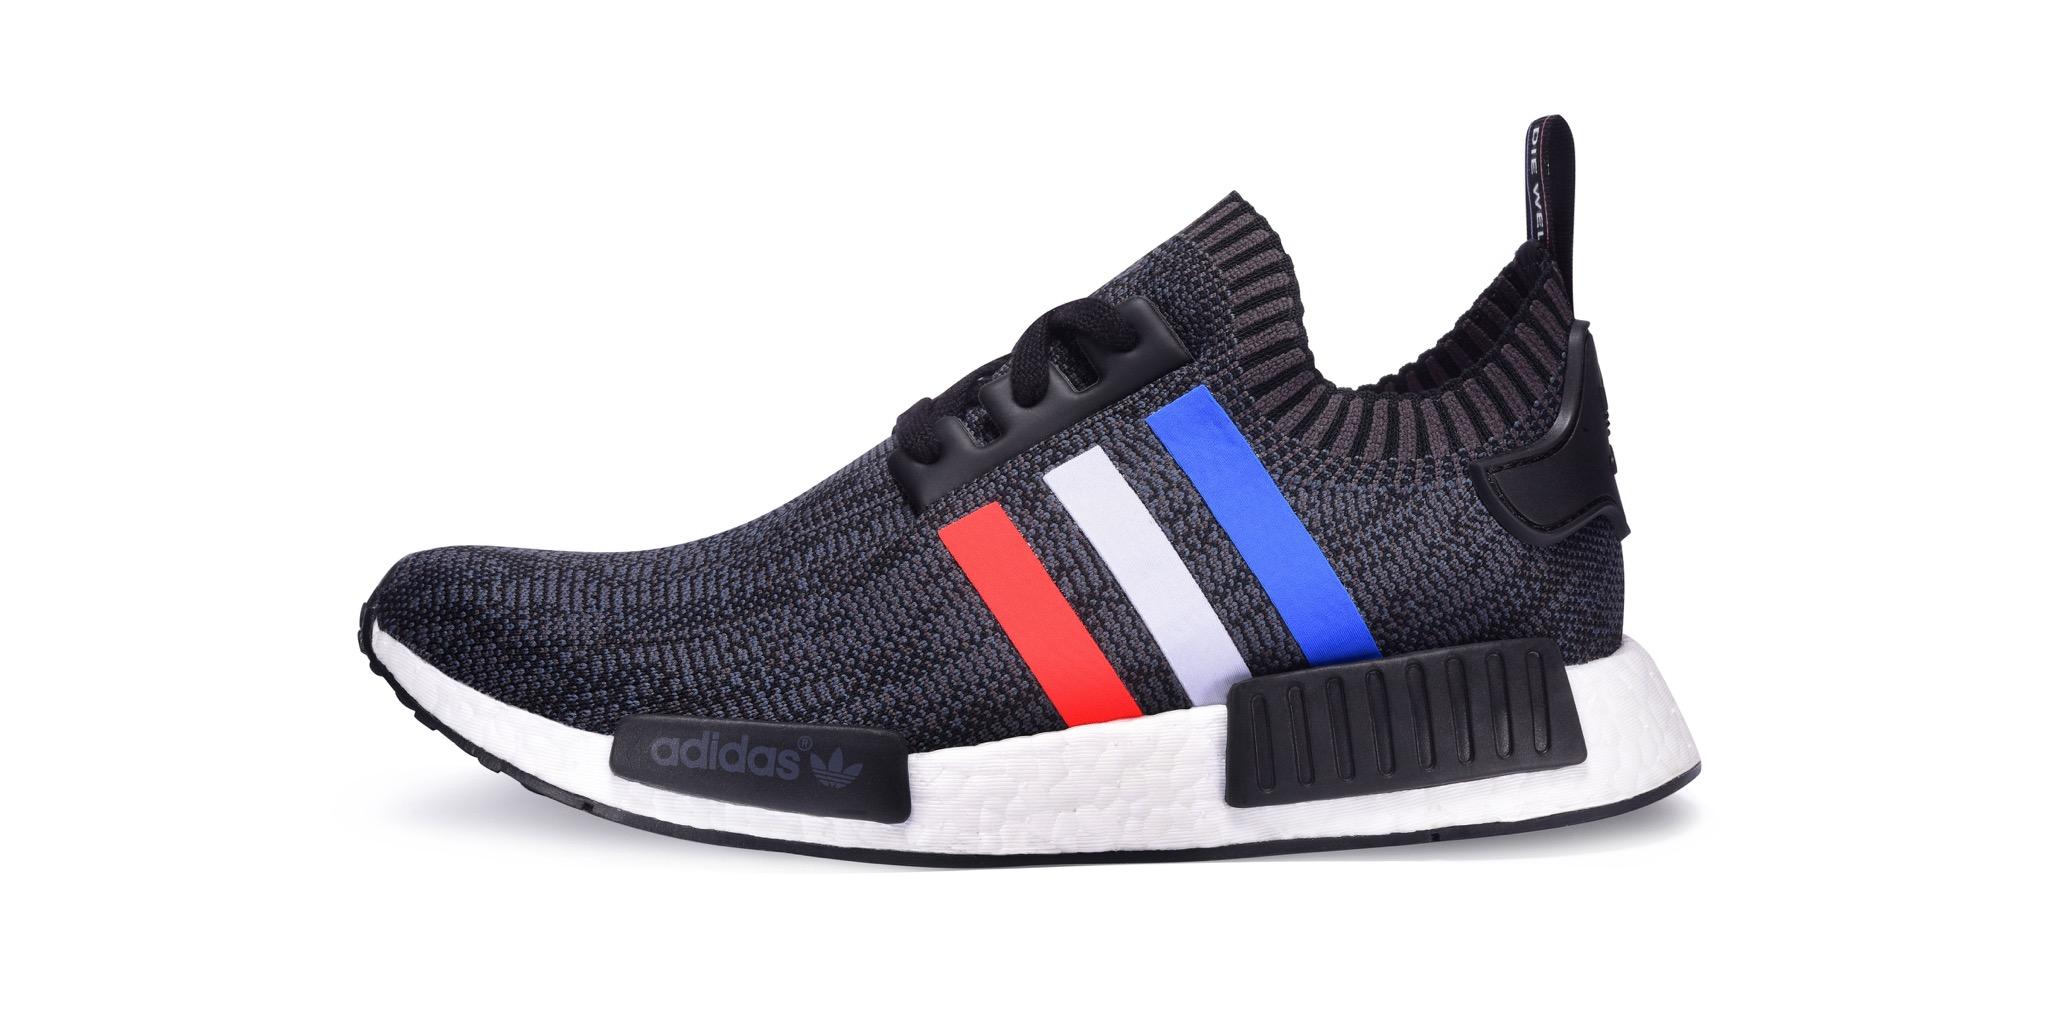 High_1600_800@x3_0016_adidas-NMD-Black-Red-White-Blue_10777